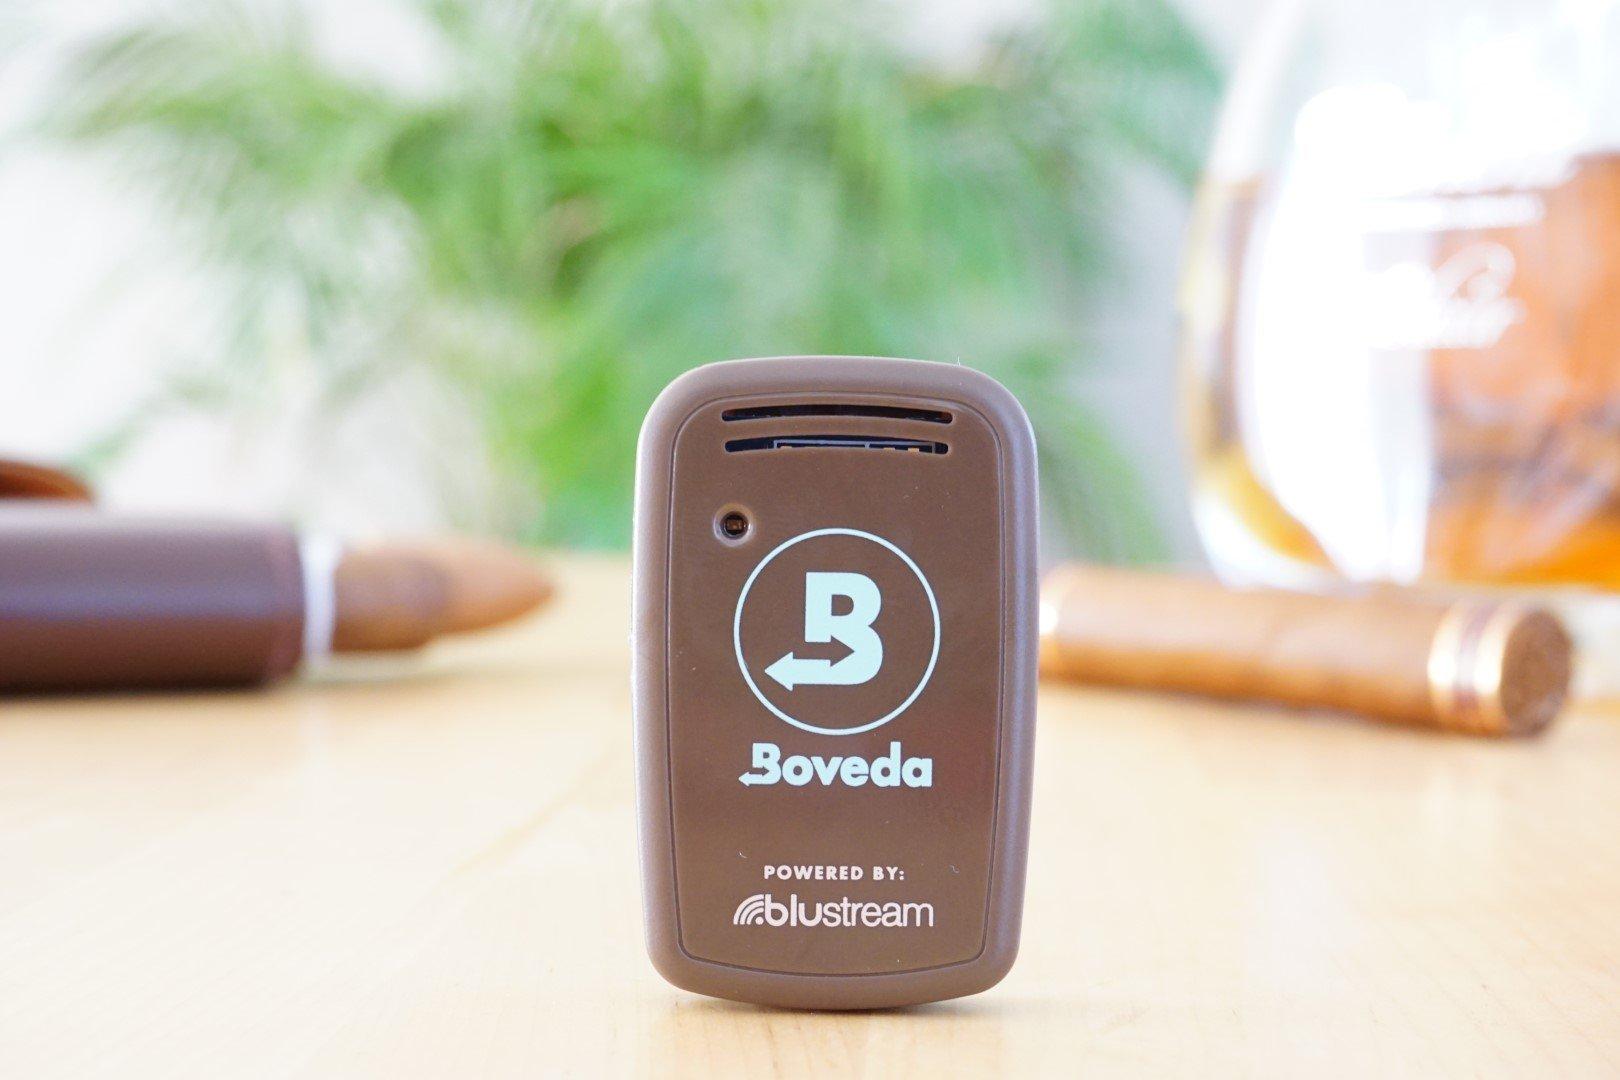 Hygromètre connecté Boveda Butler : Test & Avis